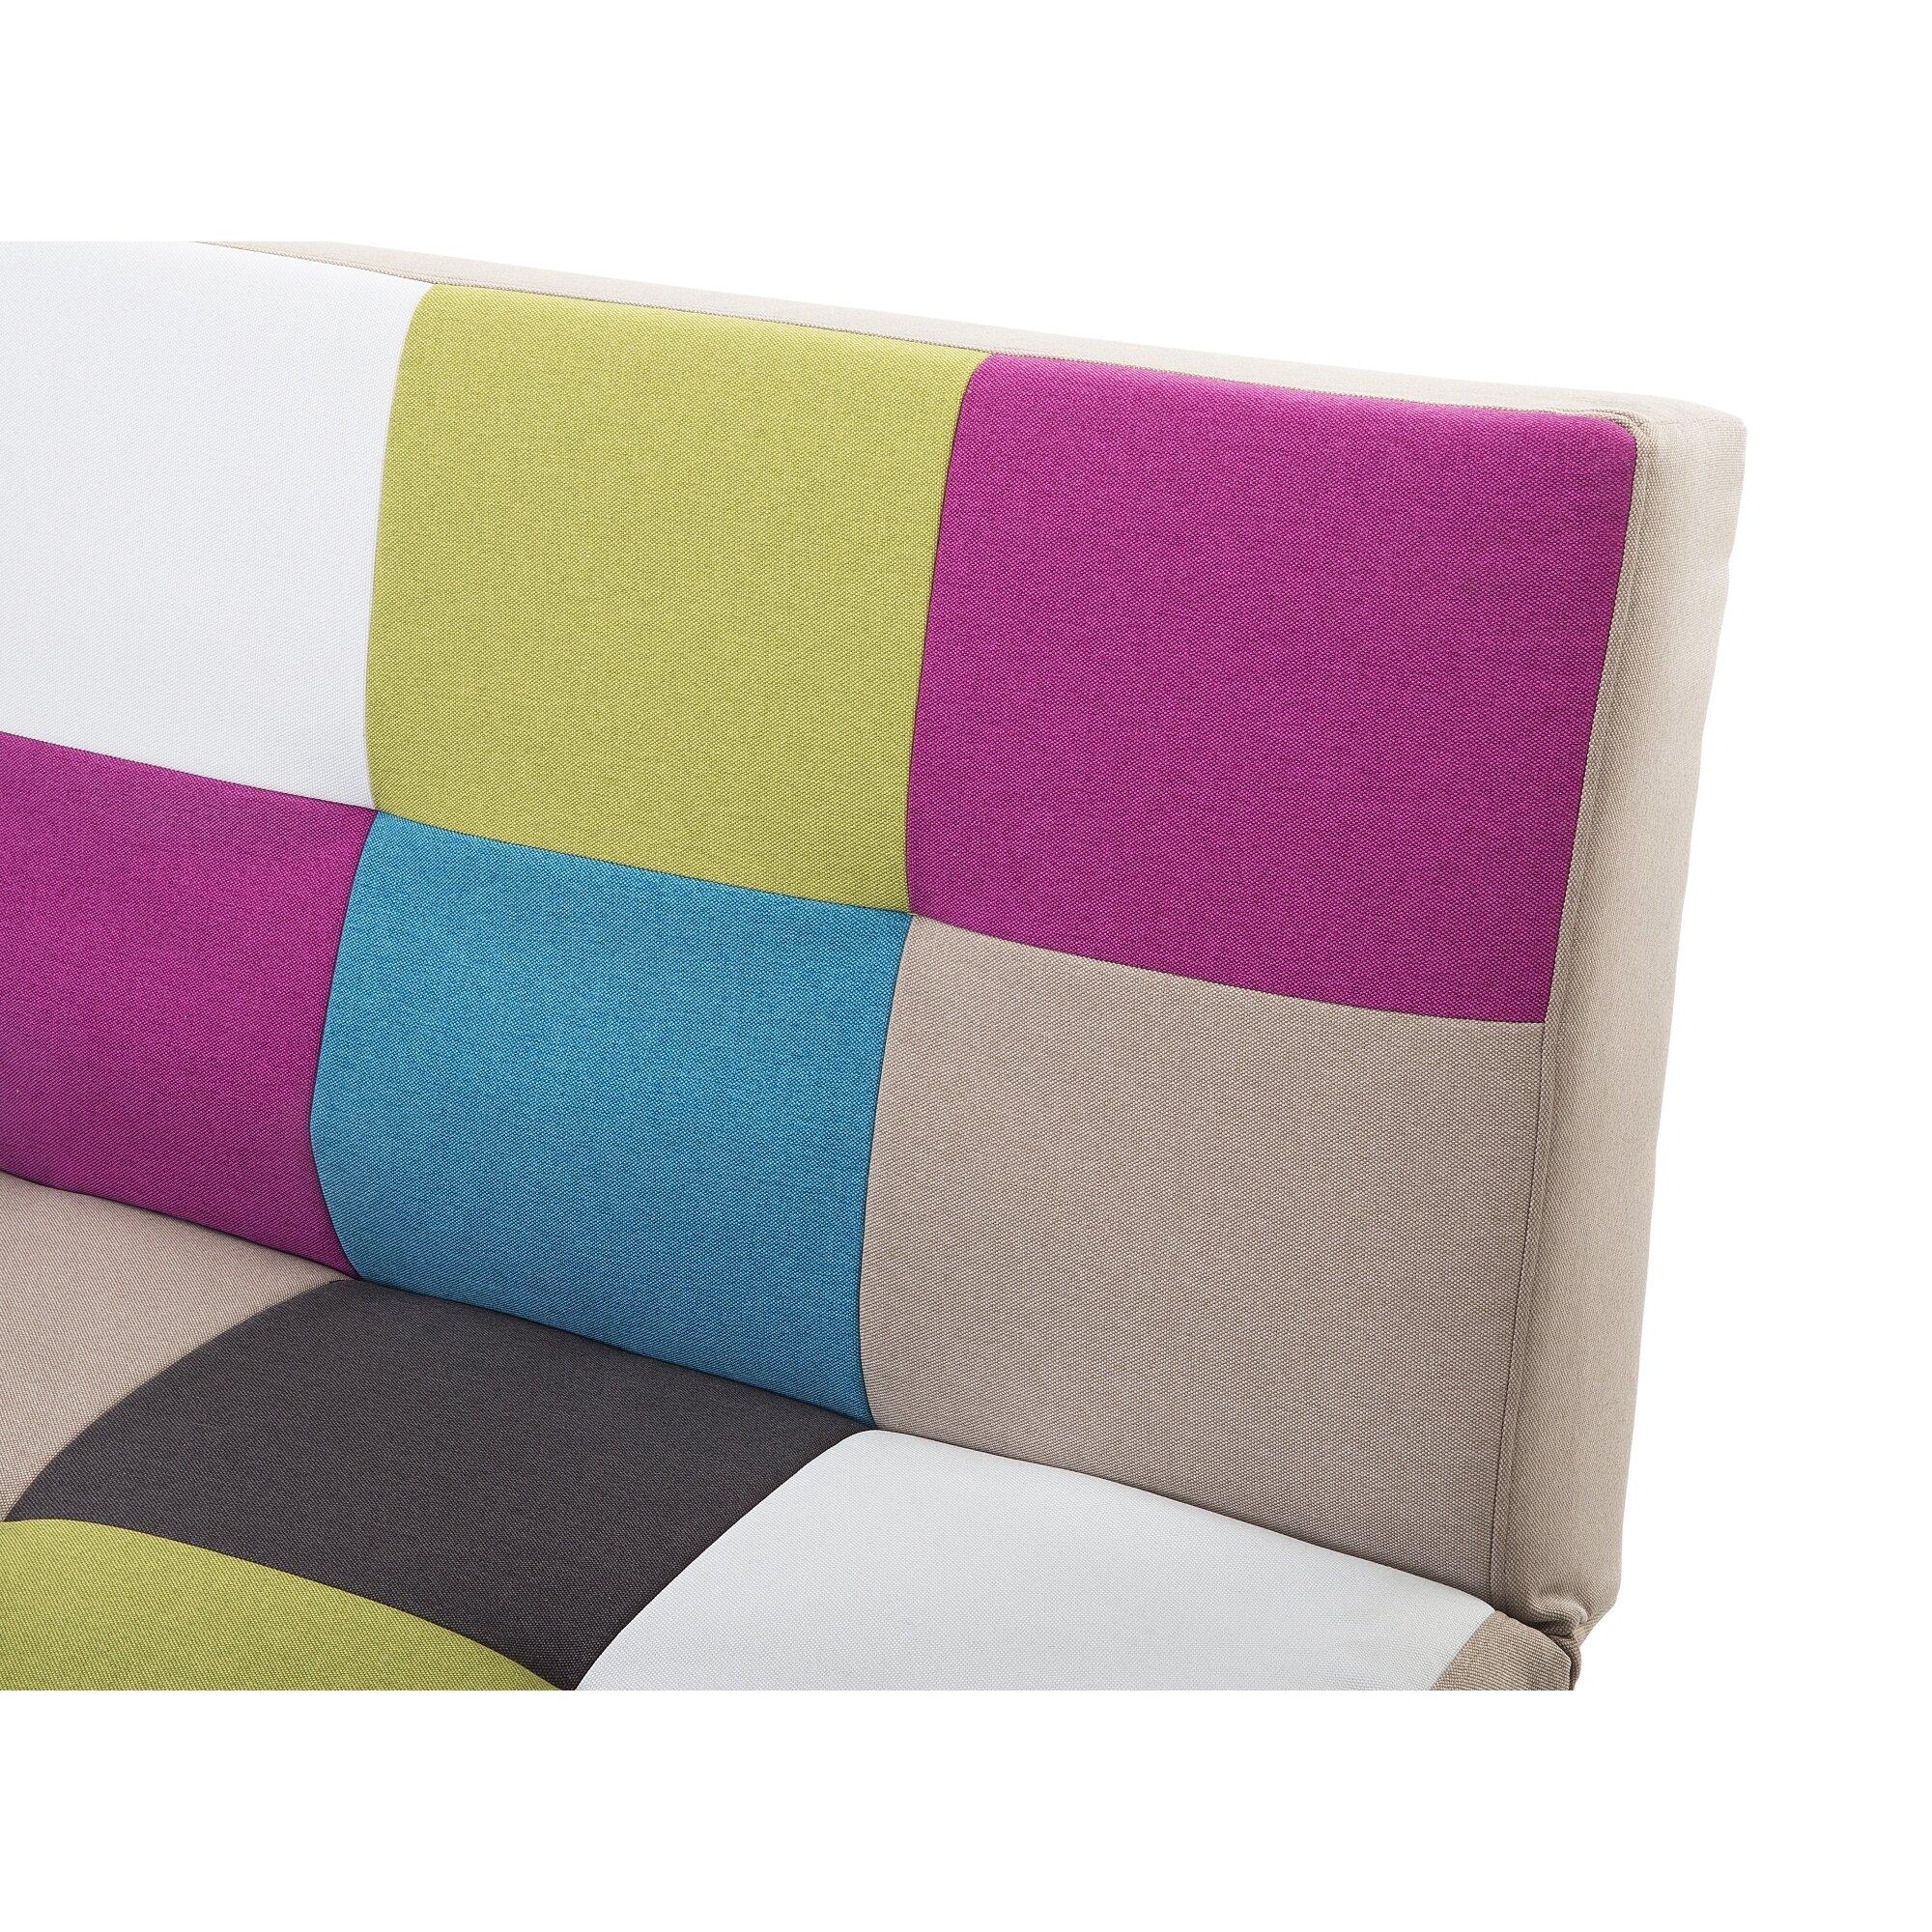 Home loft concept leo 3 seater clic clac sofa bed wayfair uk - Clic clac housse ...